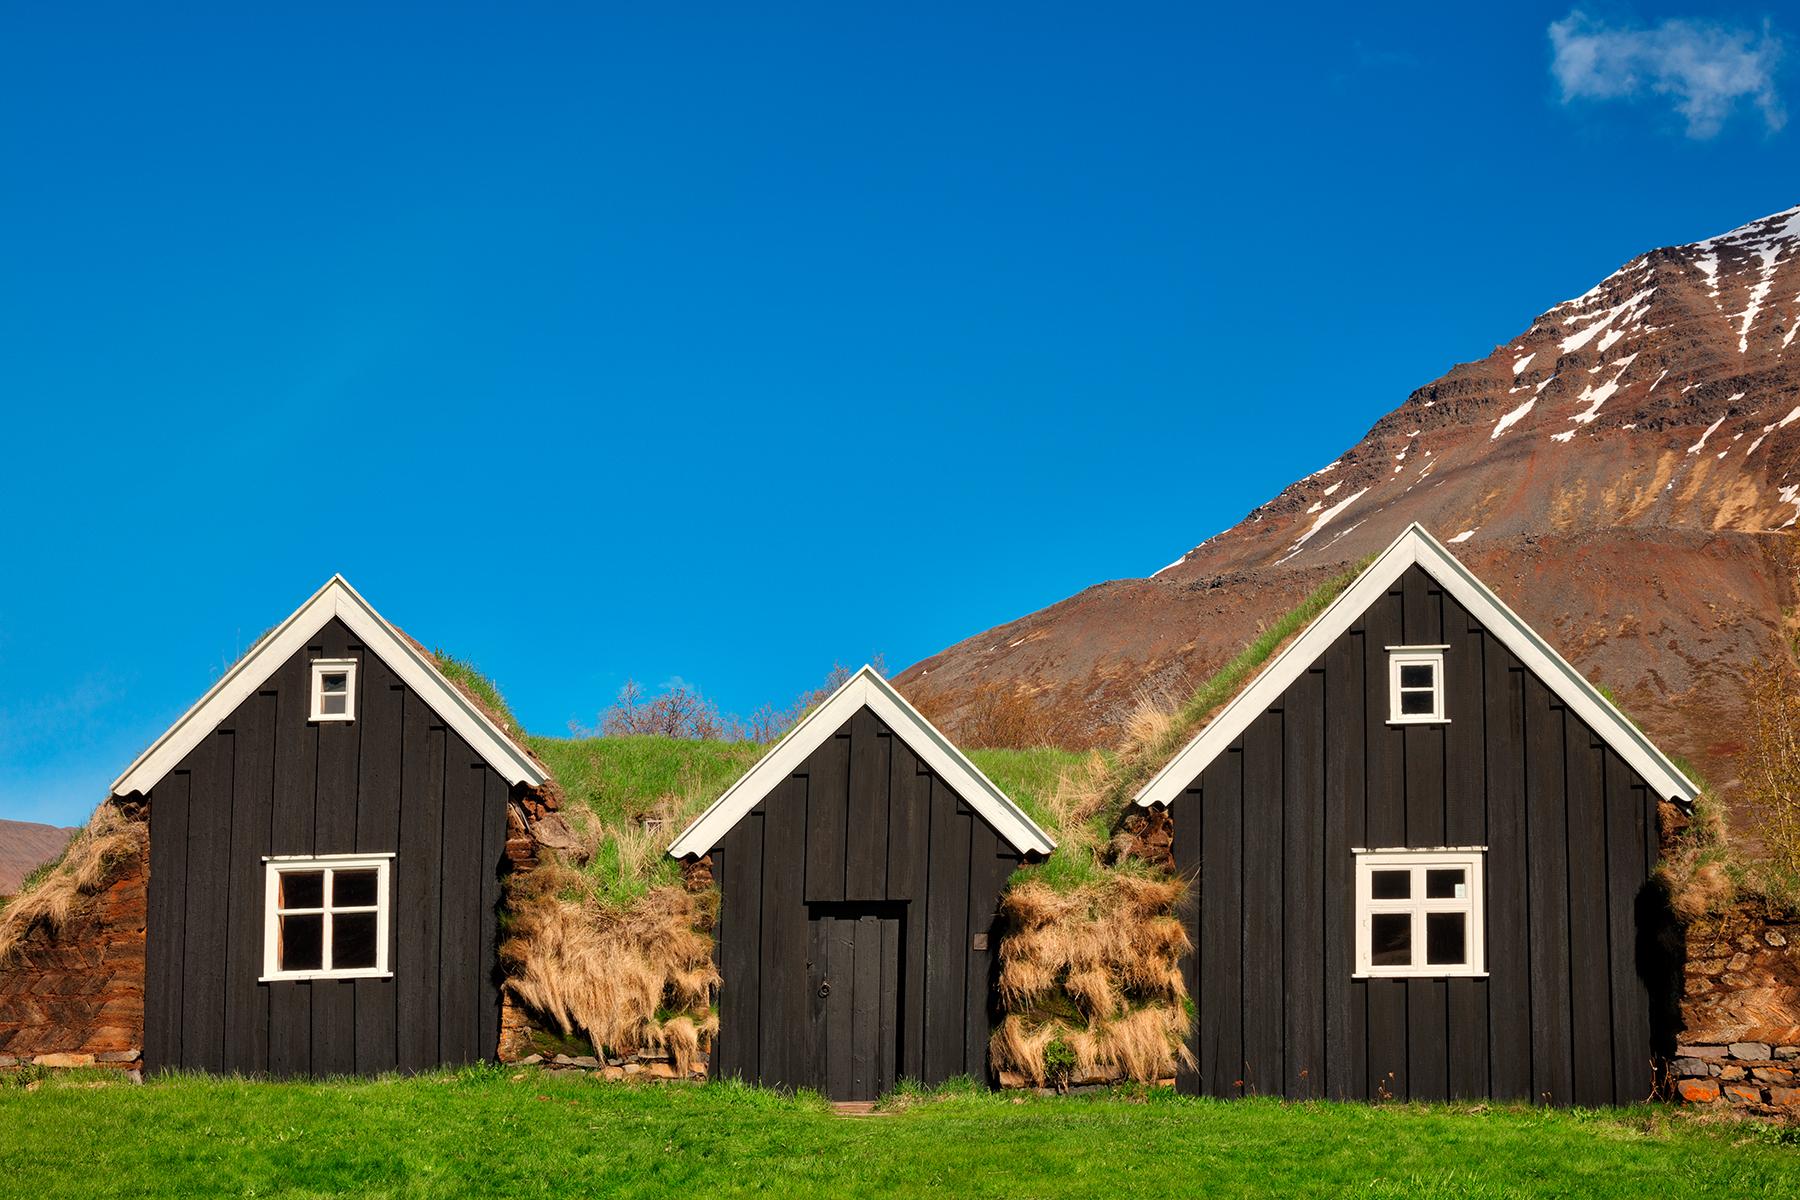 Holar Turf House, Age, Region, Scenic, Scenery, HQ Photo